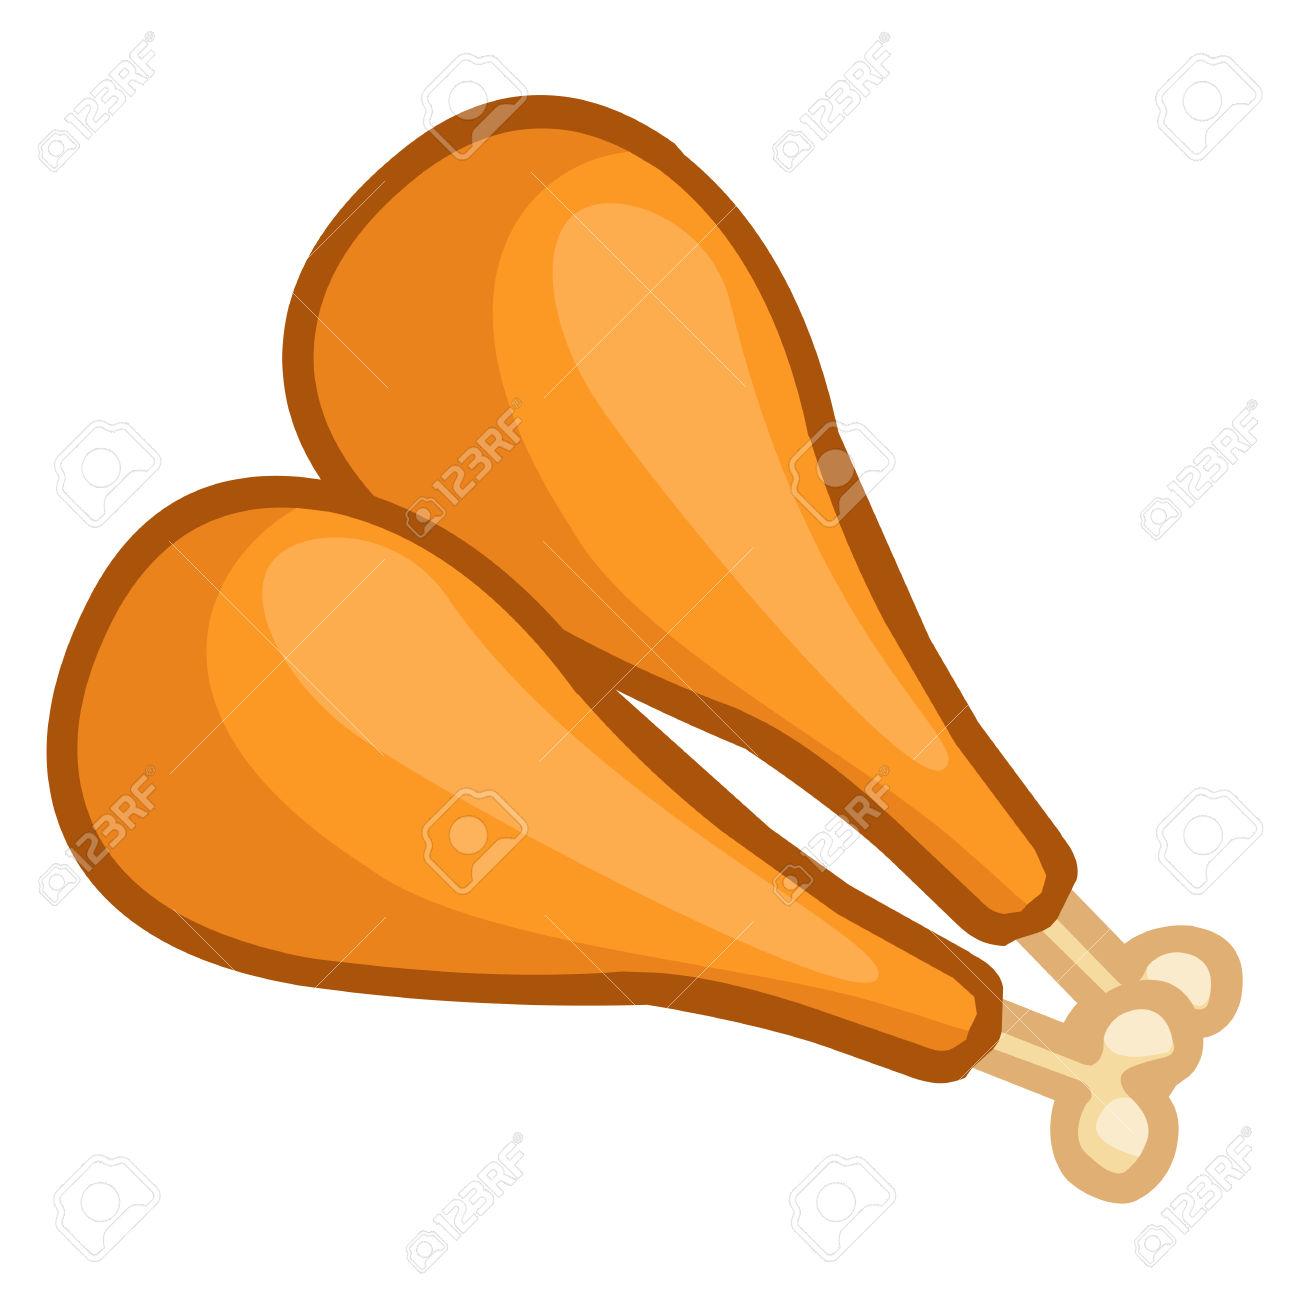 1300x1300 Fried Chicken Clip Art